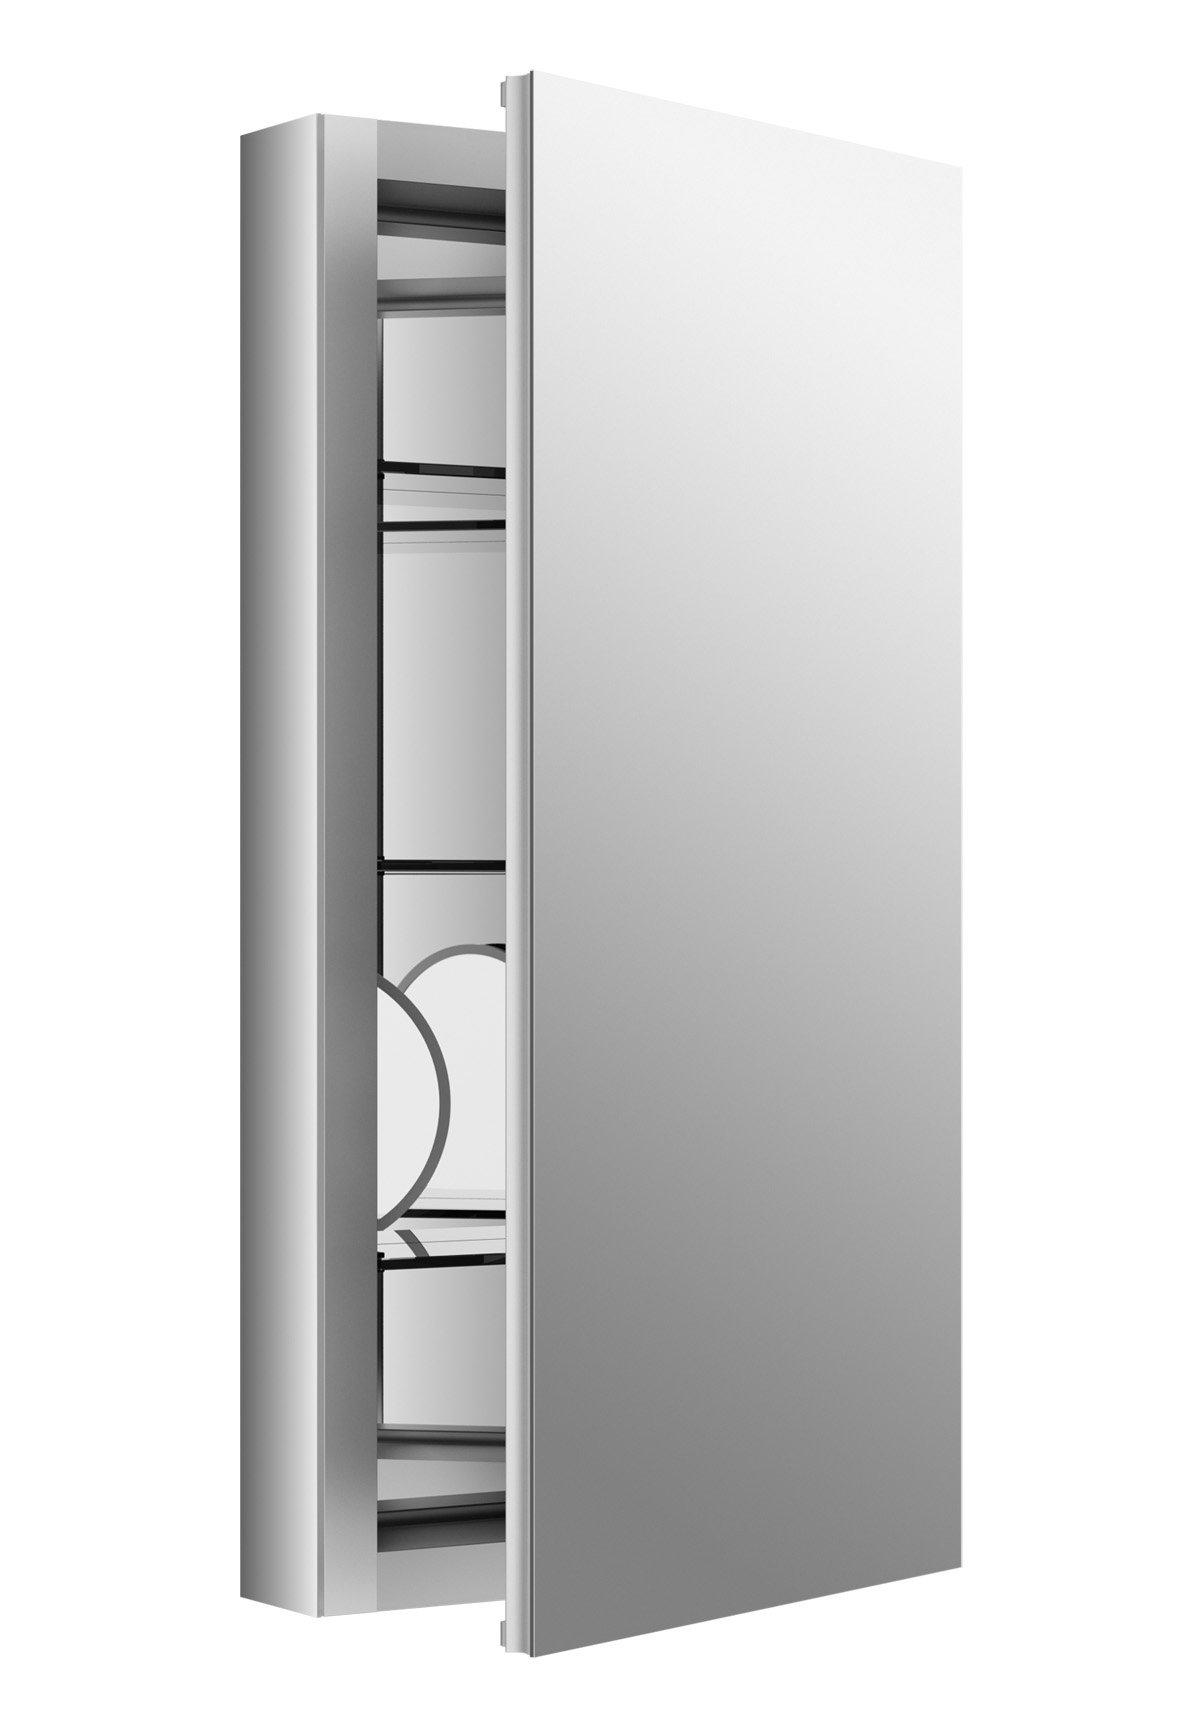 KOHLER 99001-SCF-NA Verdera Aluminum Medicine Cabinet with Adjustable Flip-Out flat Mirror, 15 inch W x 30 inch H Verdera Medicine Cabinet with Adjustable Flip-Out flat Mirror, 15 inch W x 30 inch H